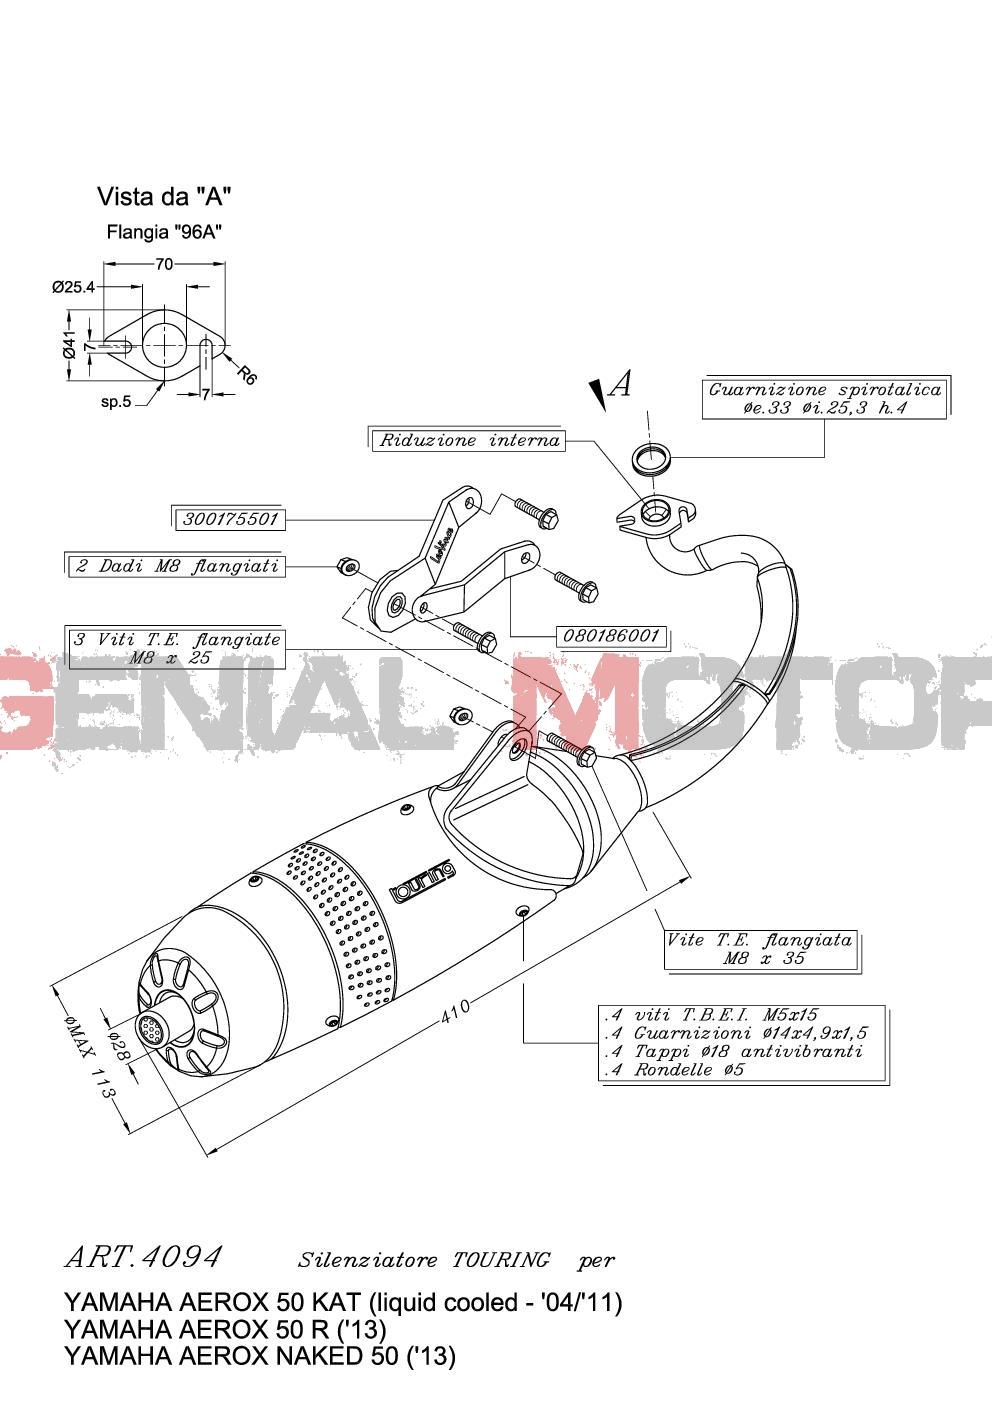 4094 Pot D'Echappement Complete Leovince Touring Yamaha Aerox 50 Kat 2004 > 2012